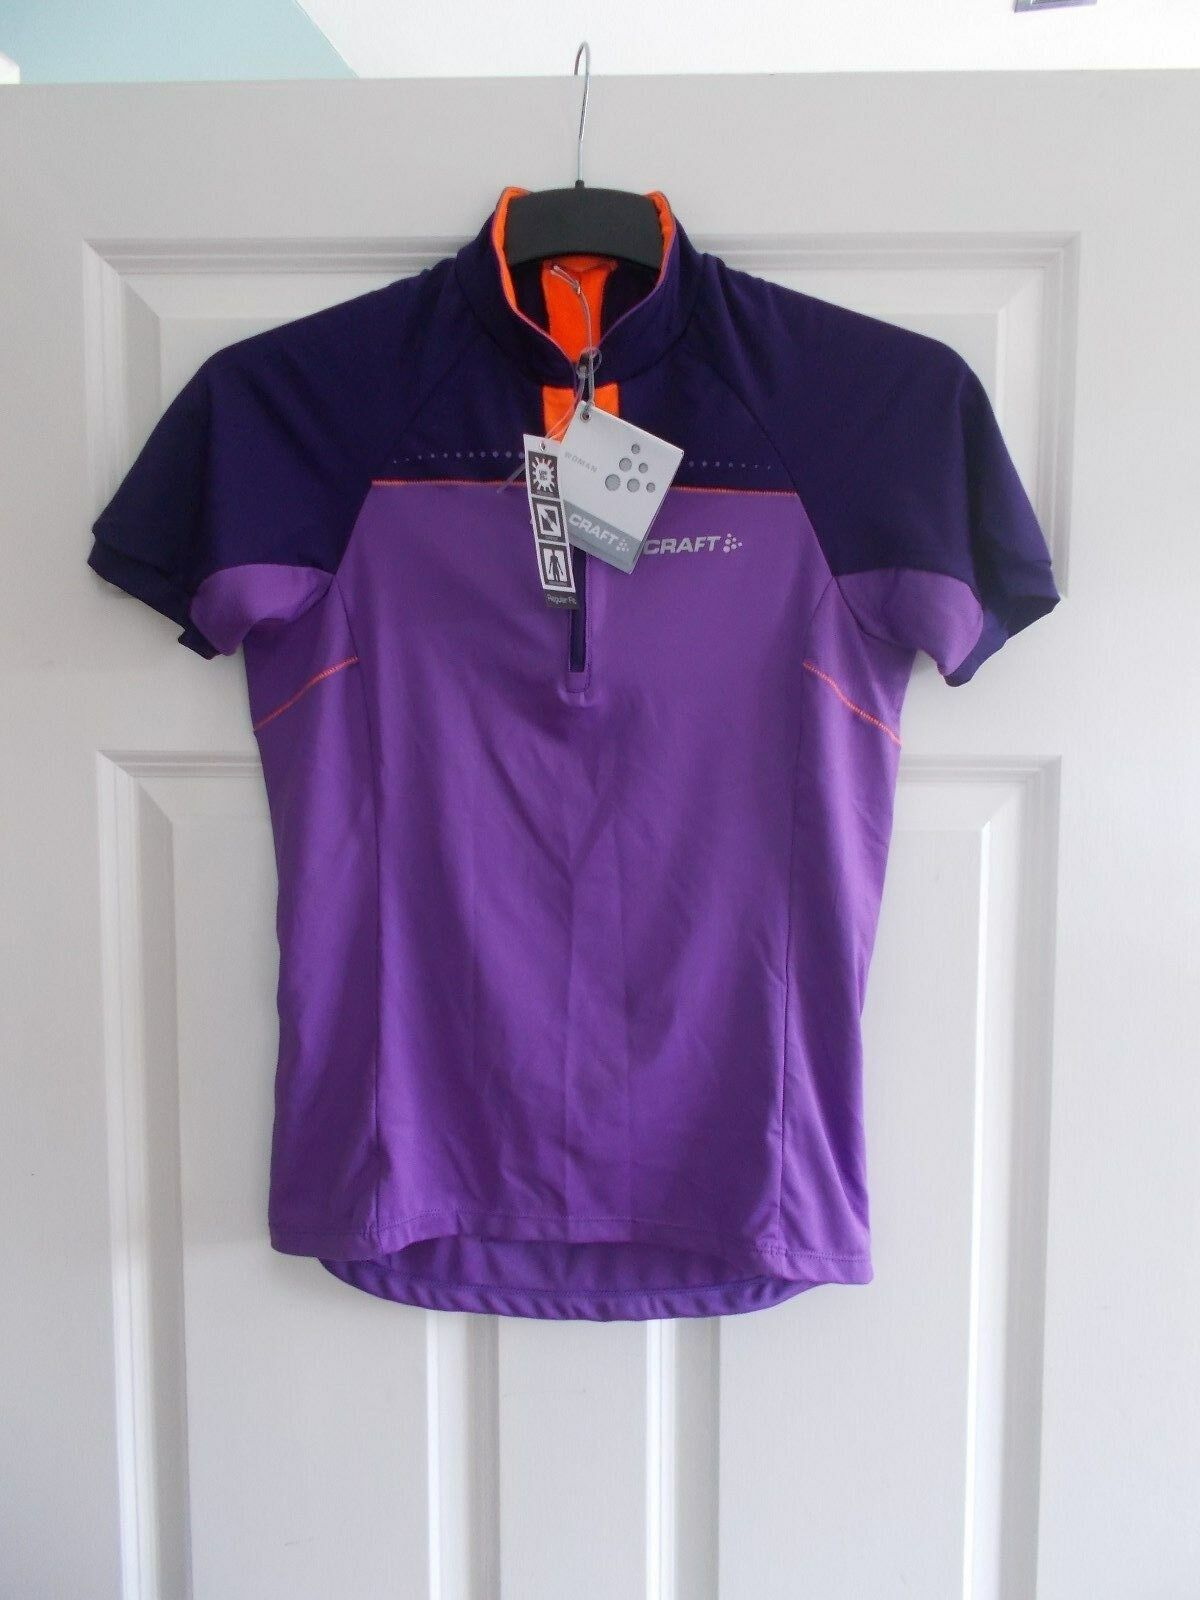 New Craft kvinnor Dynasty Move Short Slieve Half-Zipped Cycle Jersey